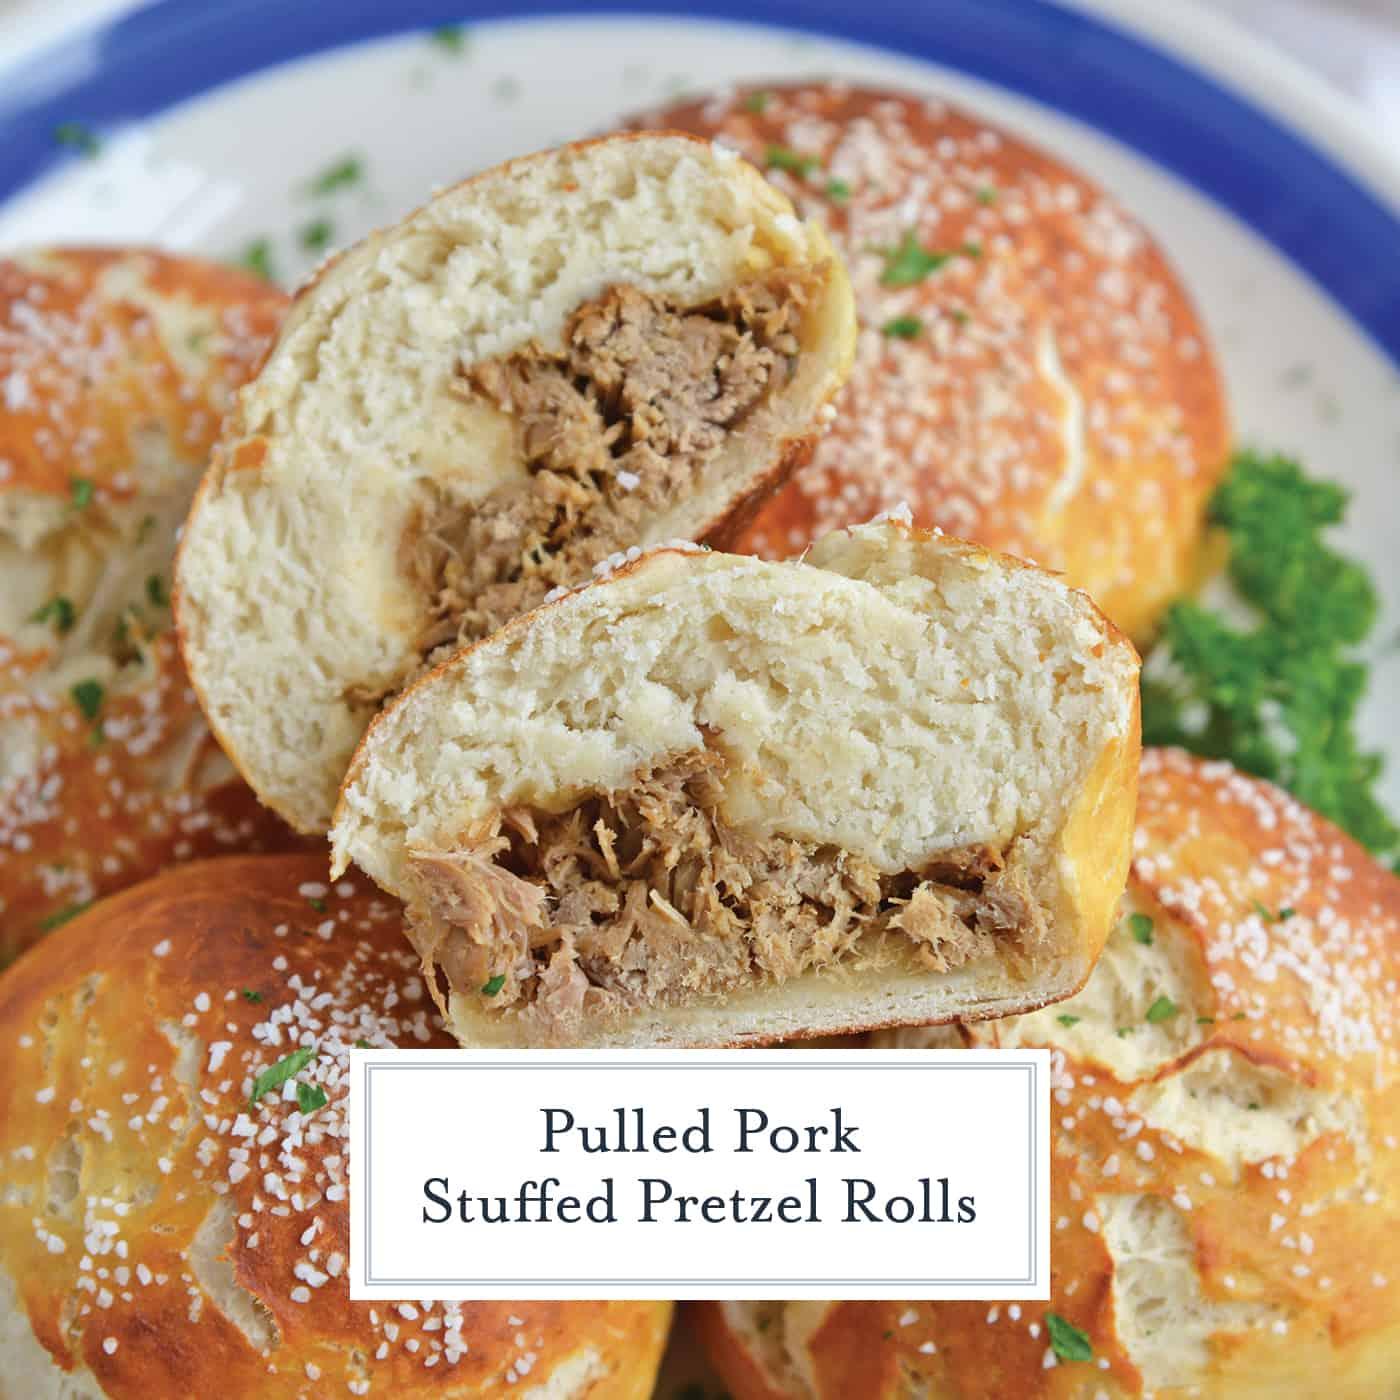 Pulled Pork Stuffed Pretzel Roll